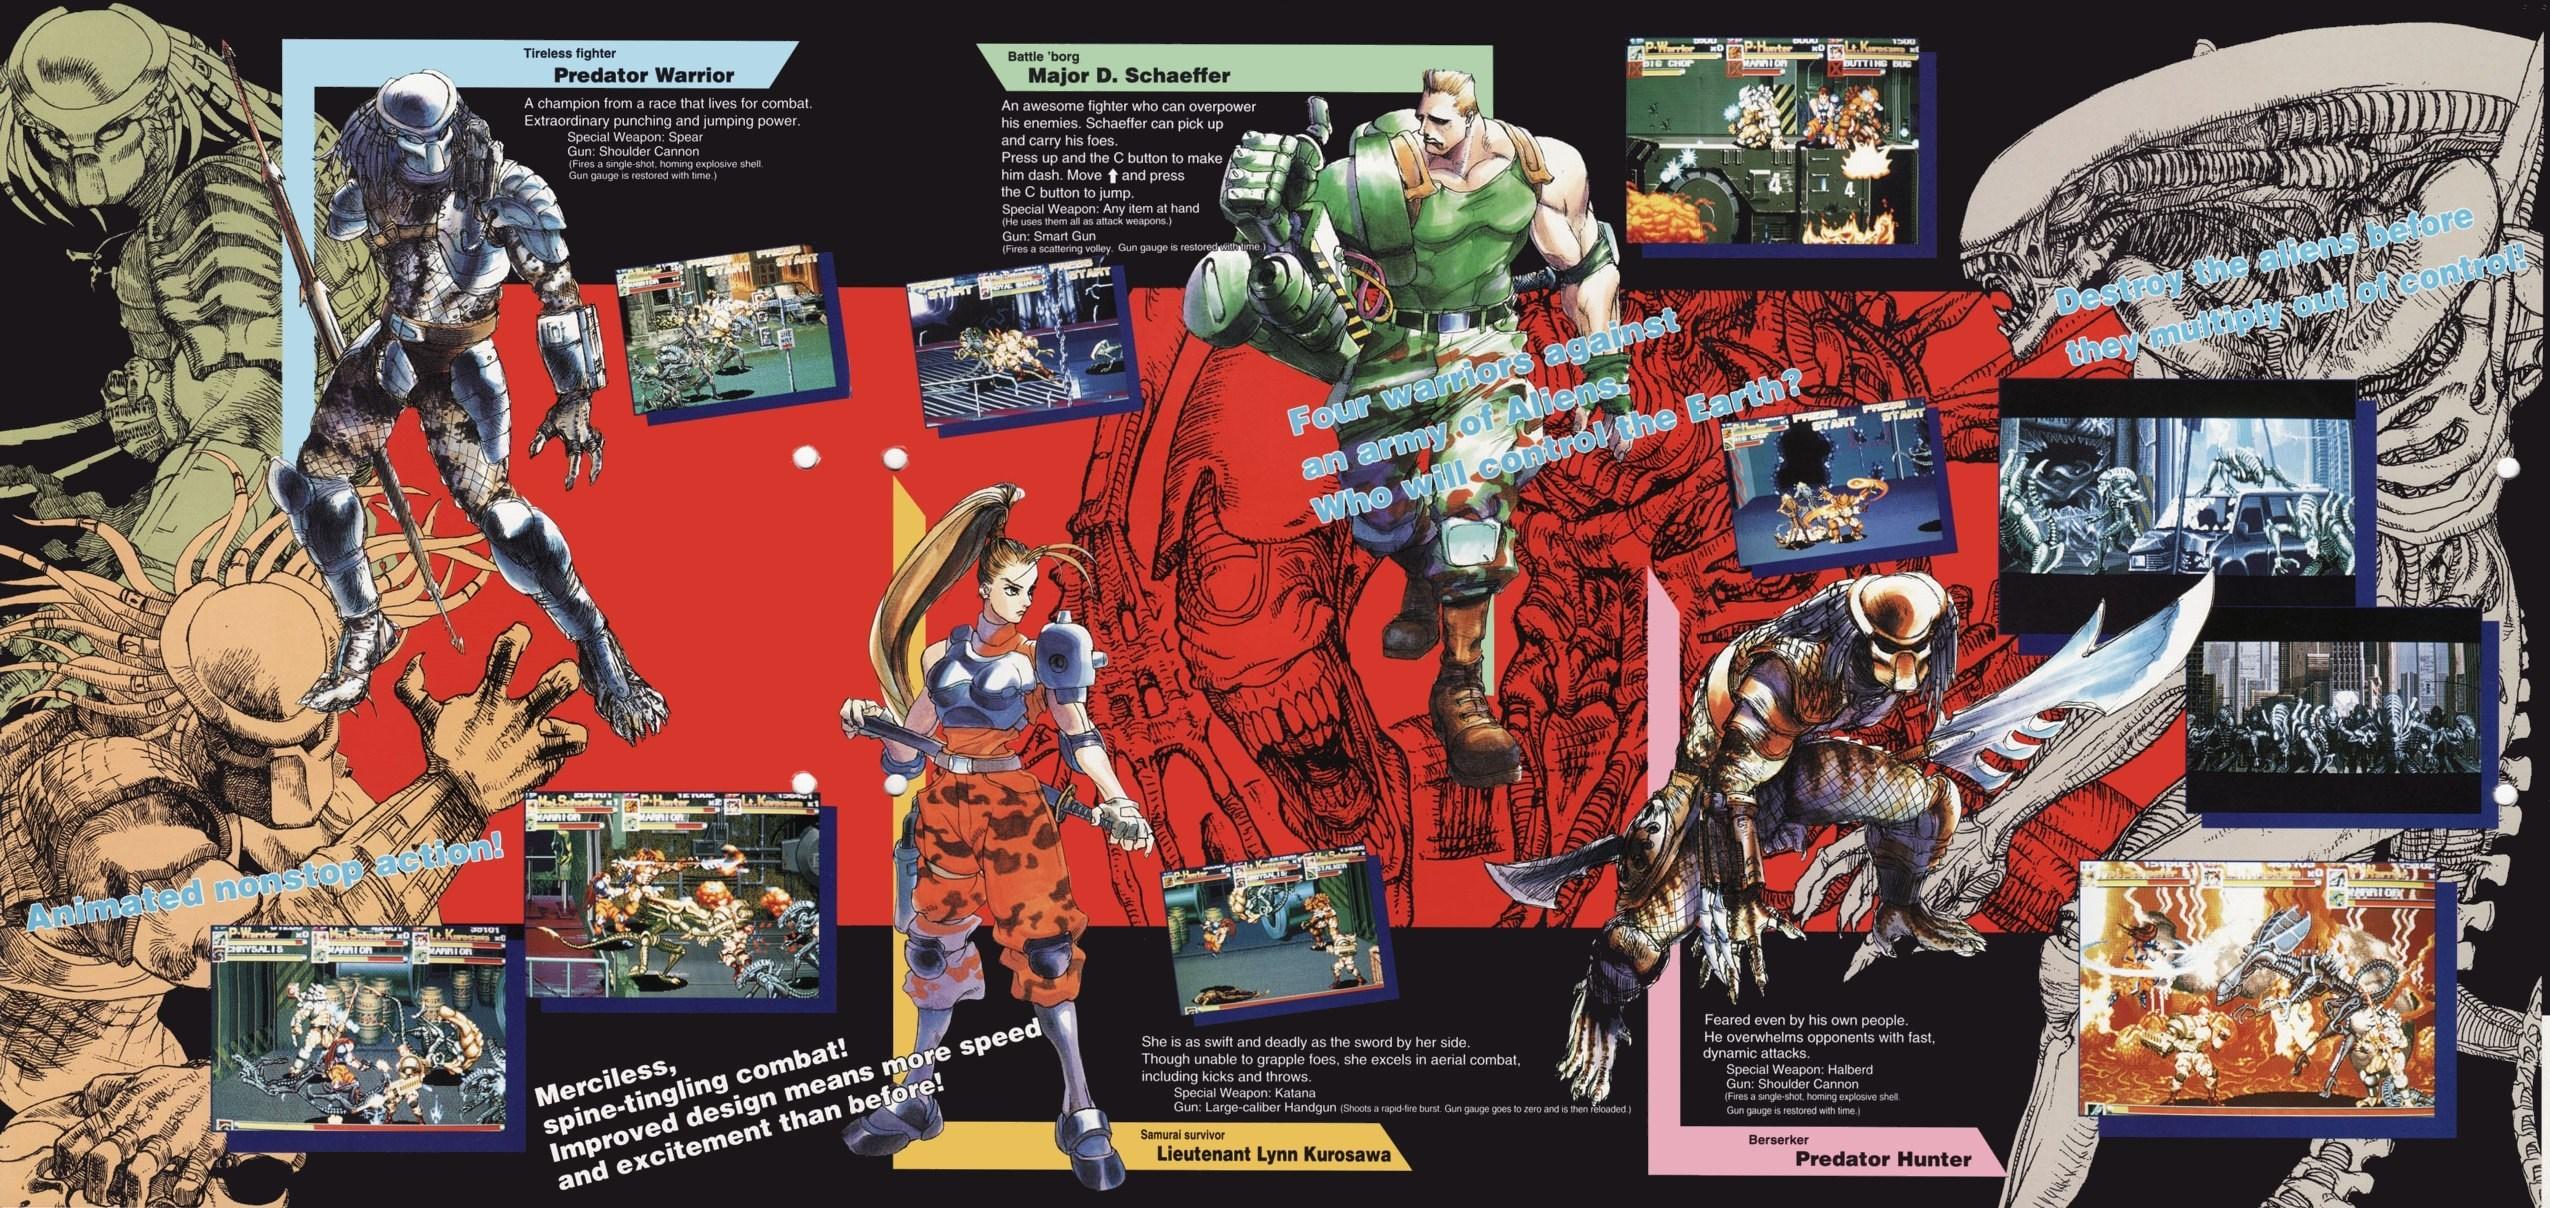 Hentai Arcade Games regarding arcade games | /v/'s recommended vidya wiki | fandom poweredwikia